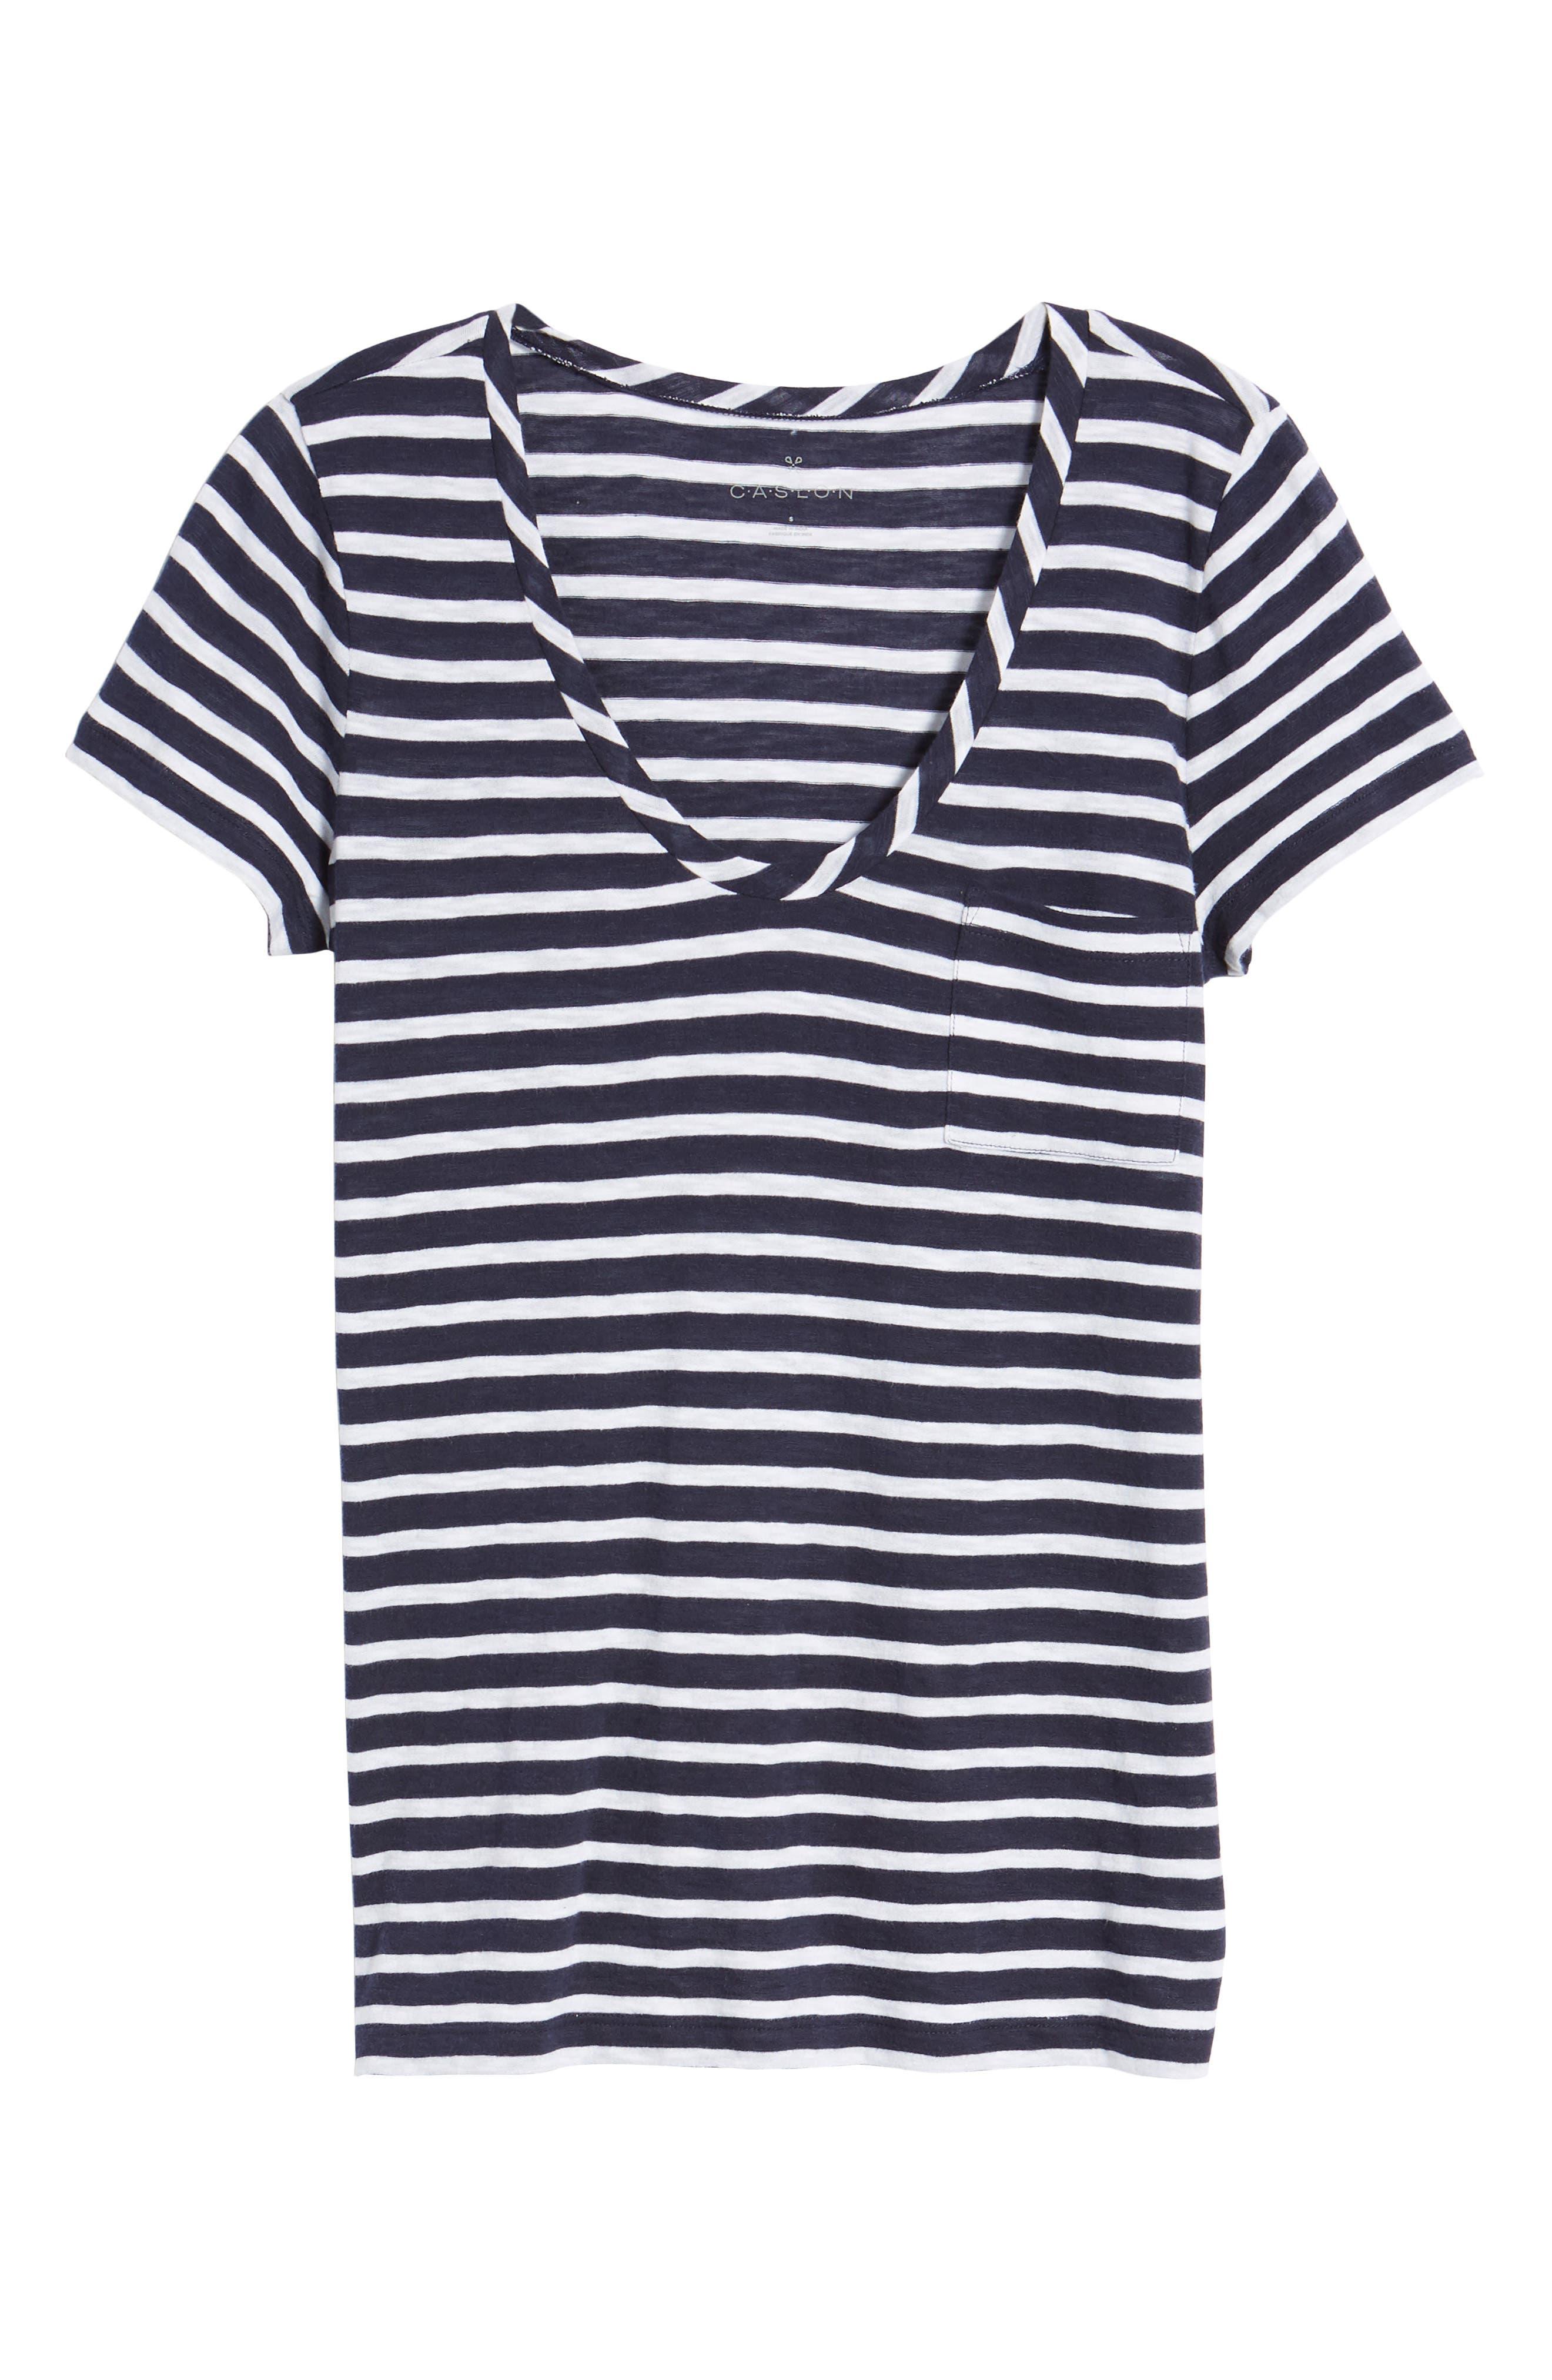 8767d5b3 Women's Short Sleeve Tops | Nordstrom